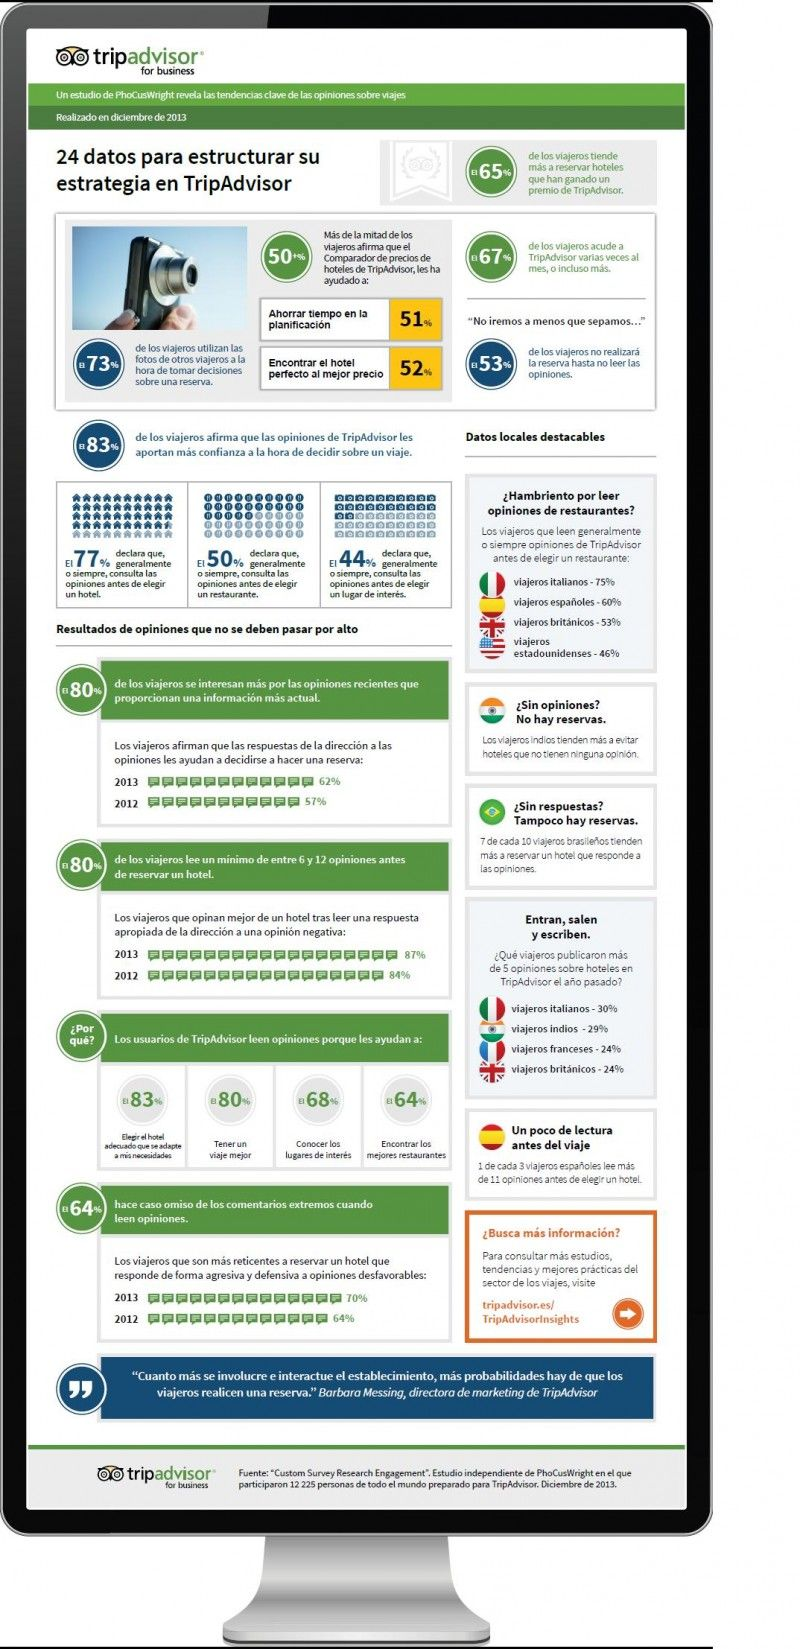 24 Data To Structure A Strategy On Tripadvisor Strategy Infographic Trip Advisor Tourism Marketing